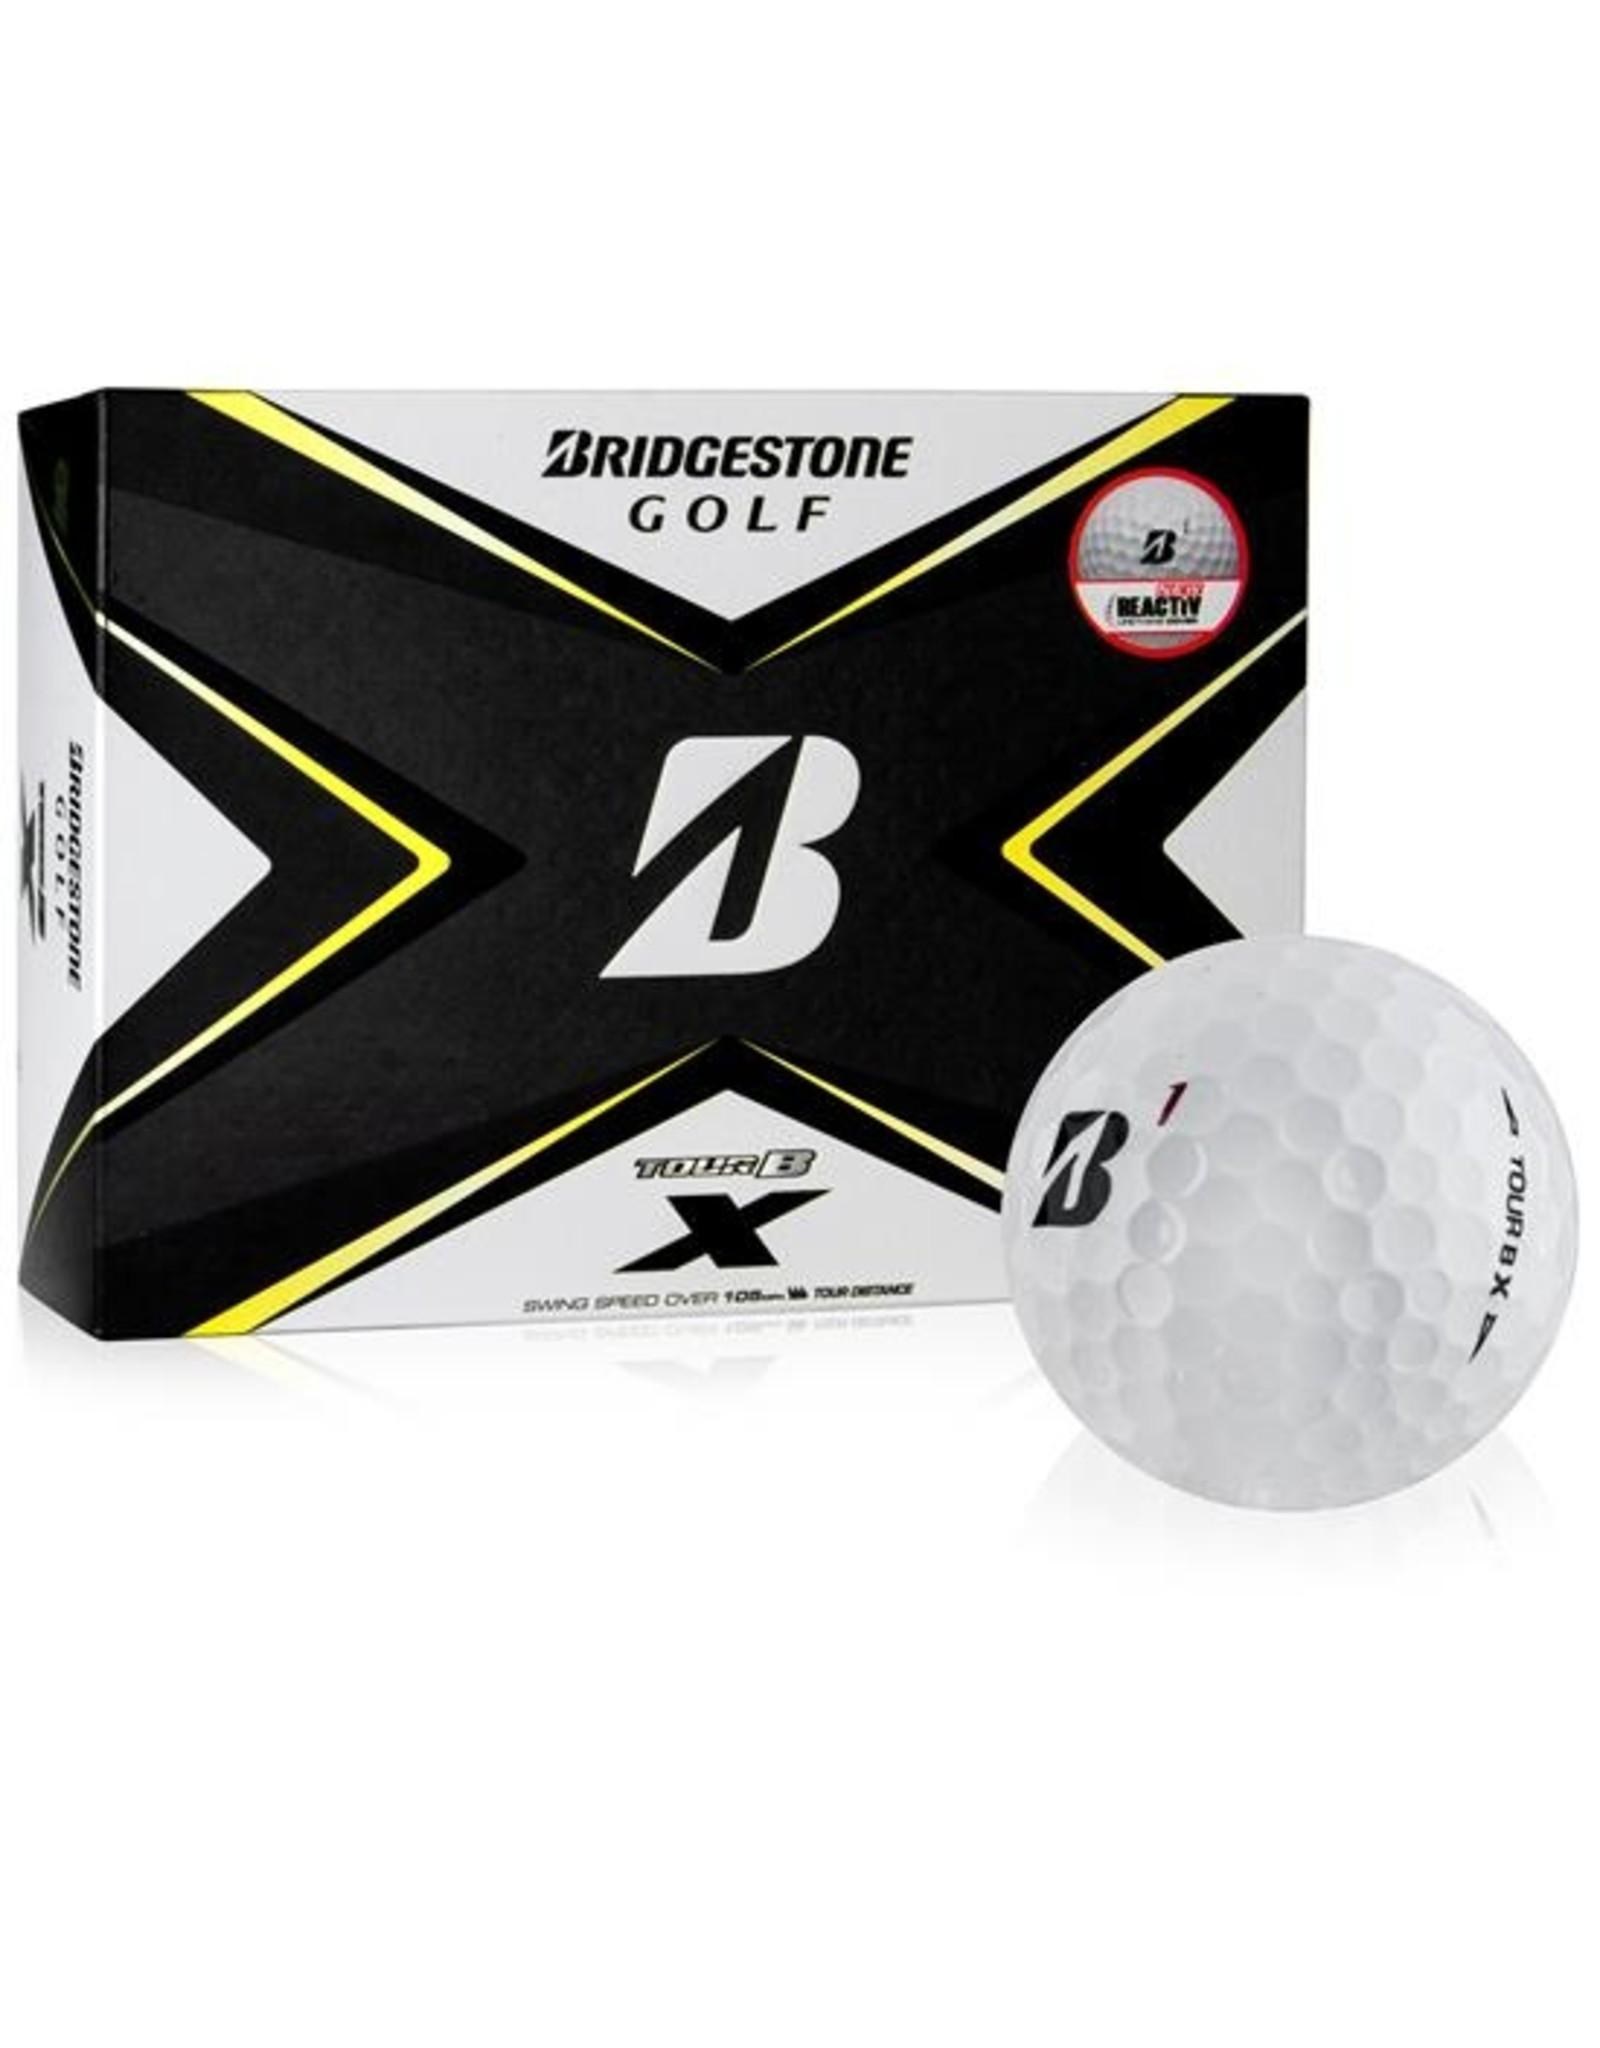 Bridgestone Bridgestone Tour B X Dozen Balls